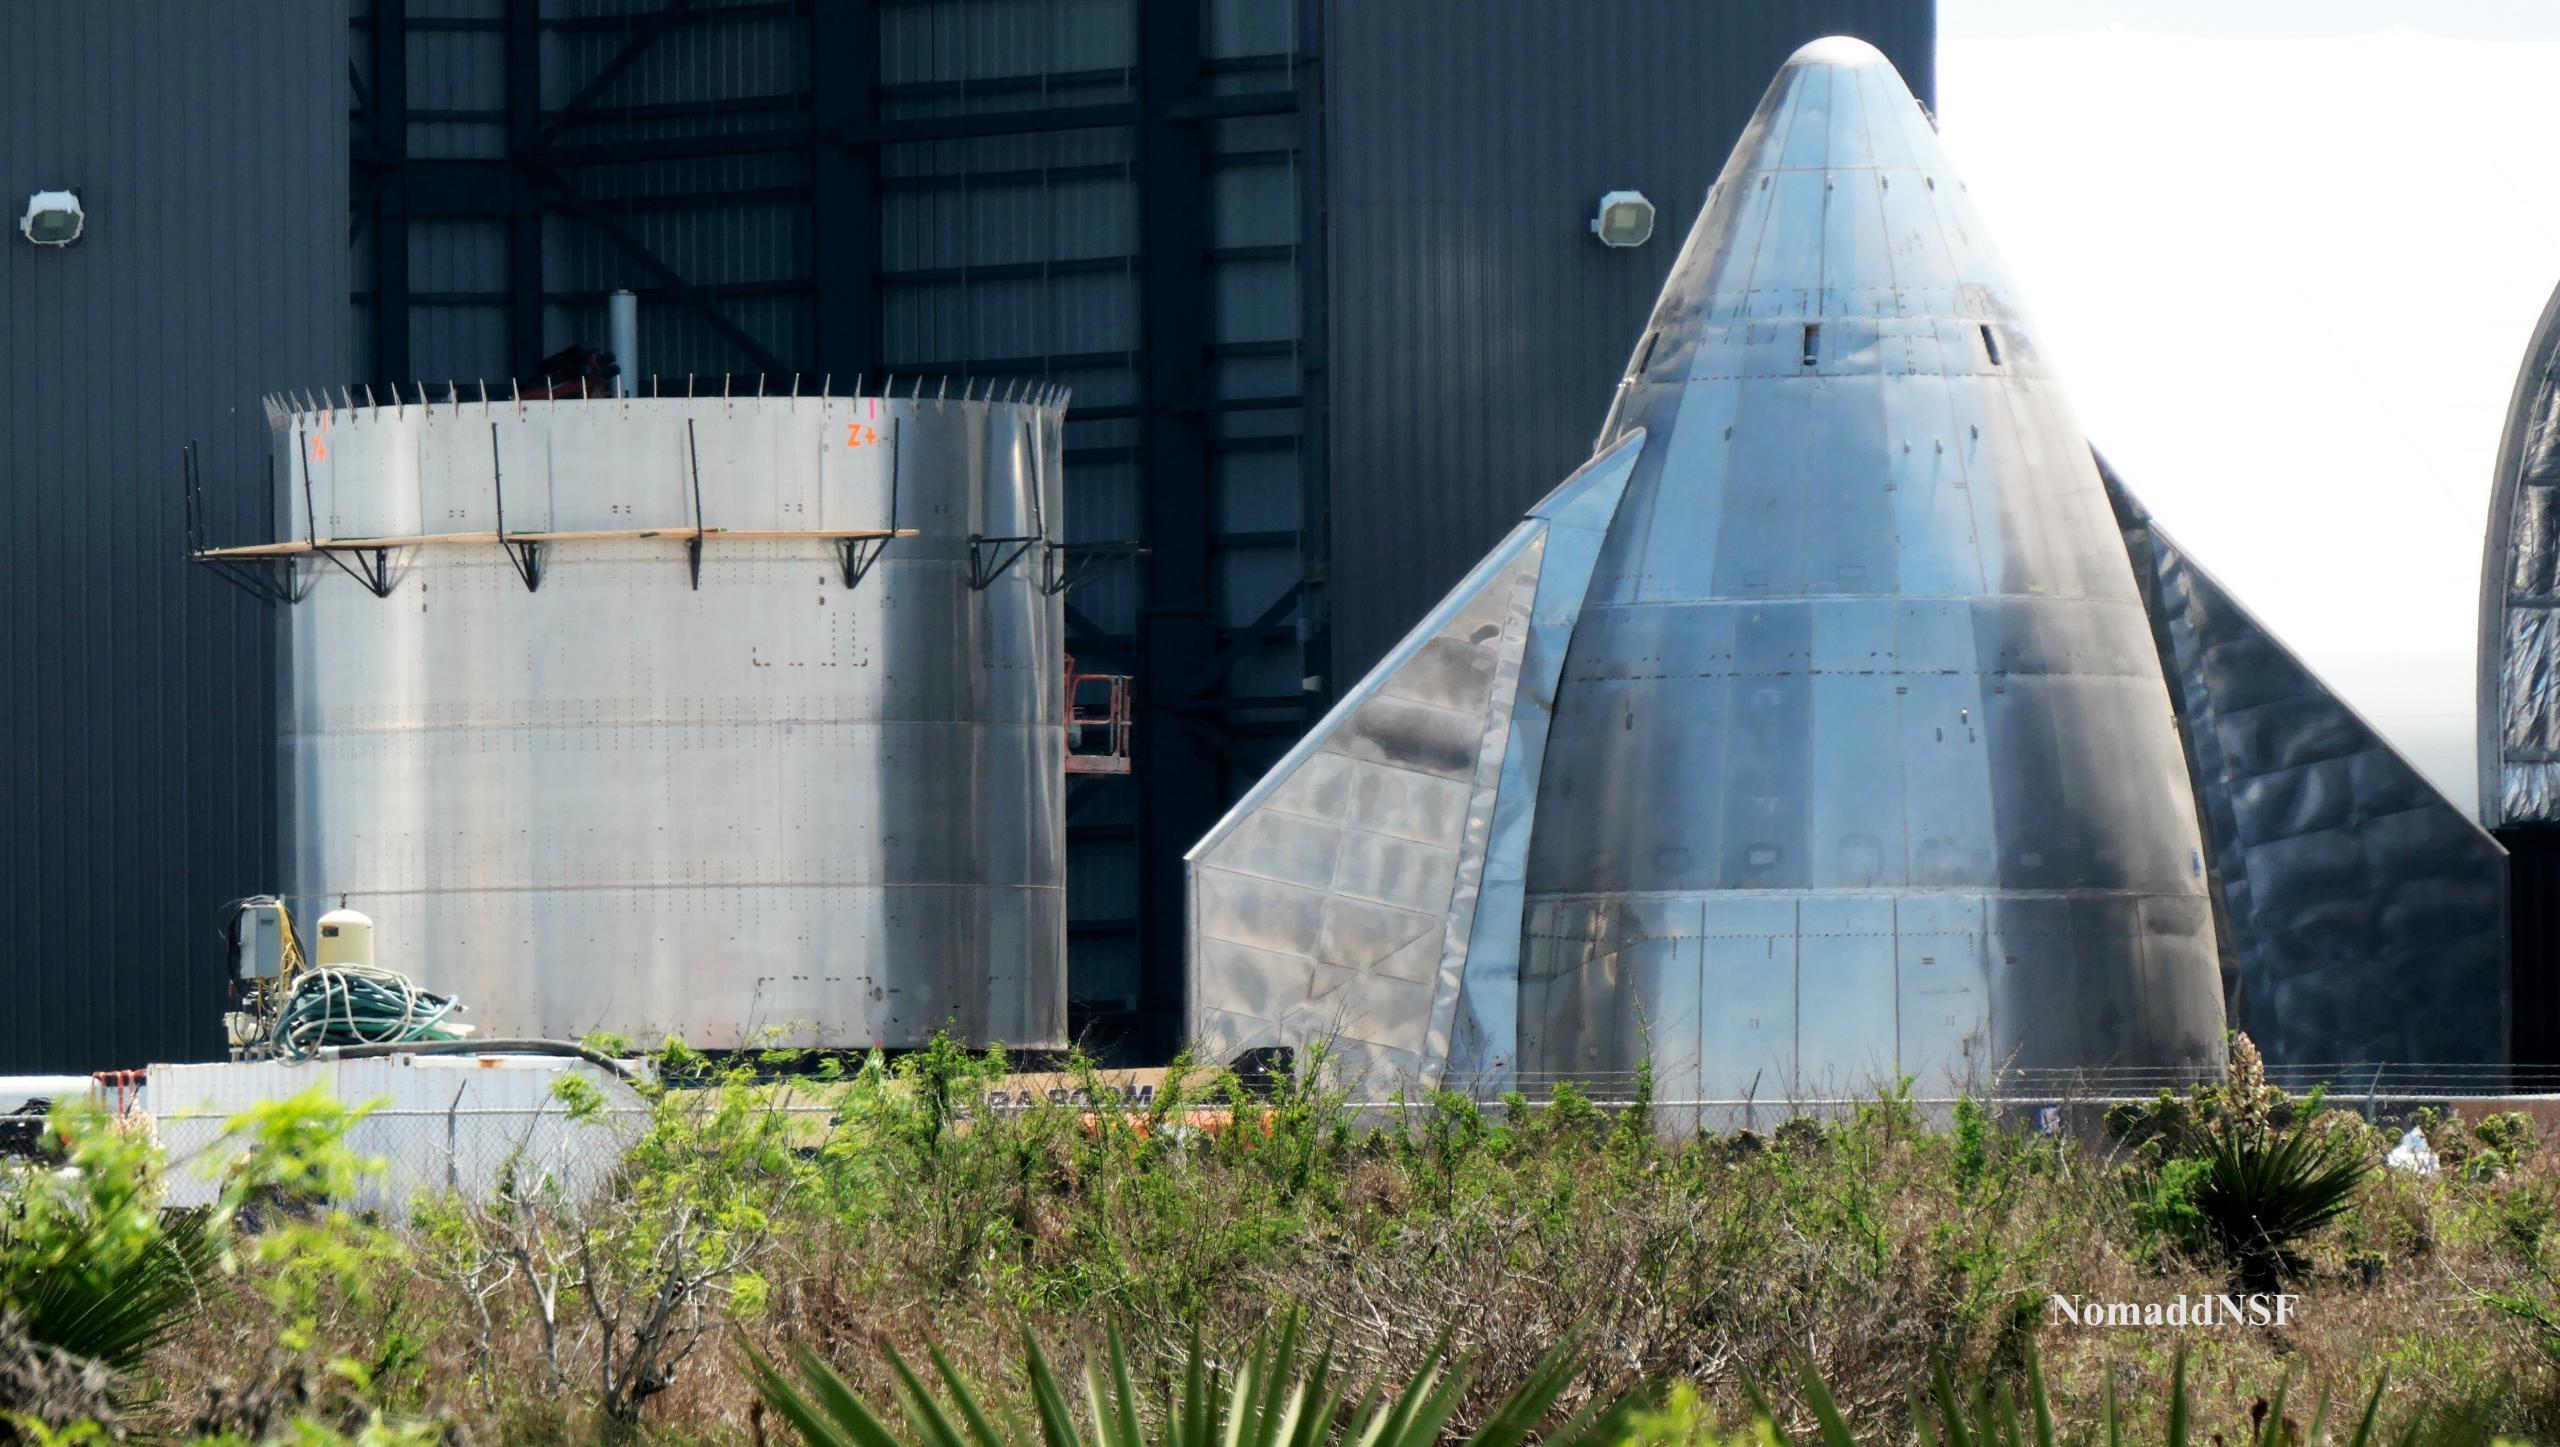 Starship Boca Chica 032721 (NASASpaceflight – Nomadd) SN15 nose stack prep 2 edit (c)